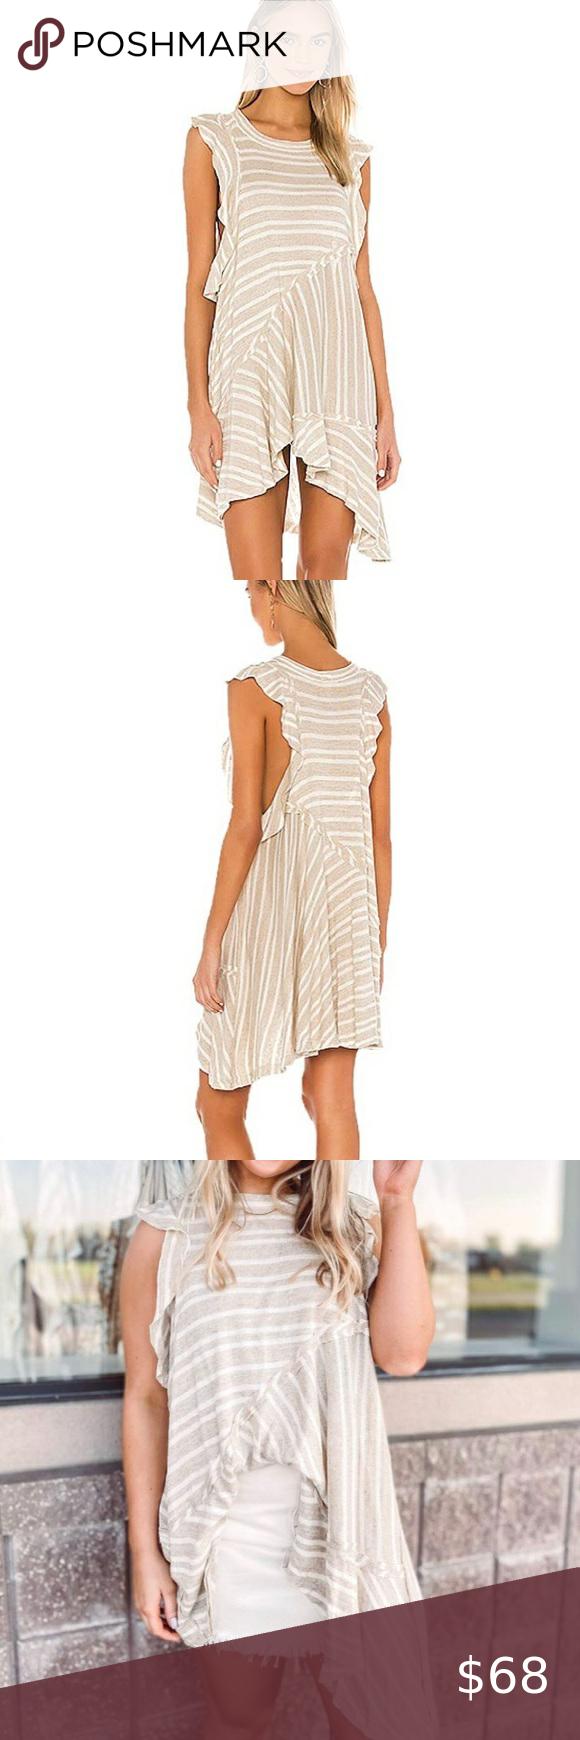 Free People Between The Line Tan White Dress Gorgeous Boho Style Free People Tan White Striped Between The Lines Fashion Clothes Design Gorgeous Dresses [ 1740 x 580 Pixel ]